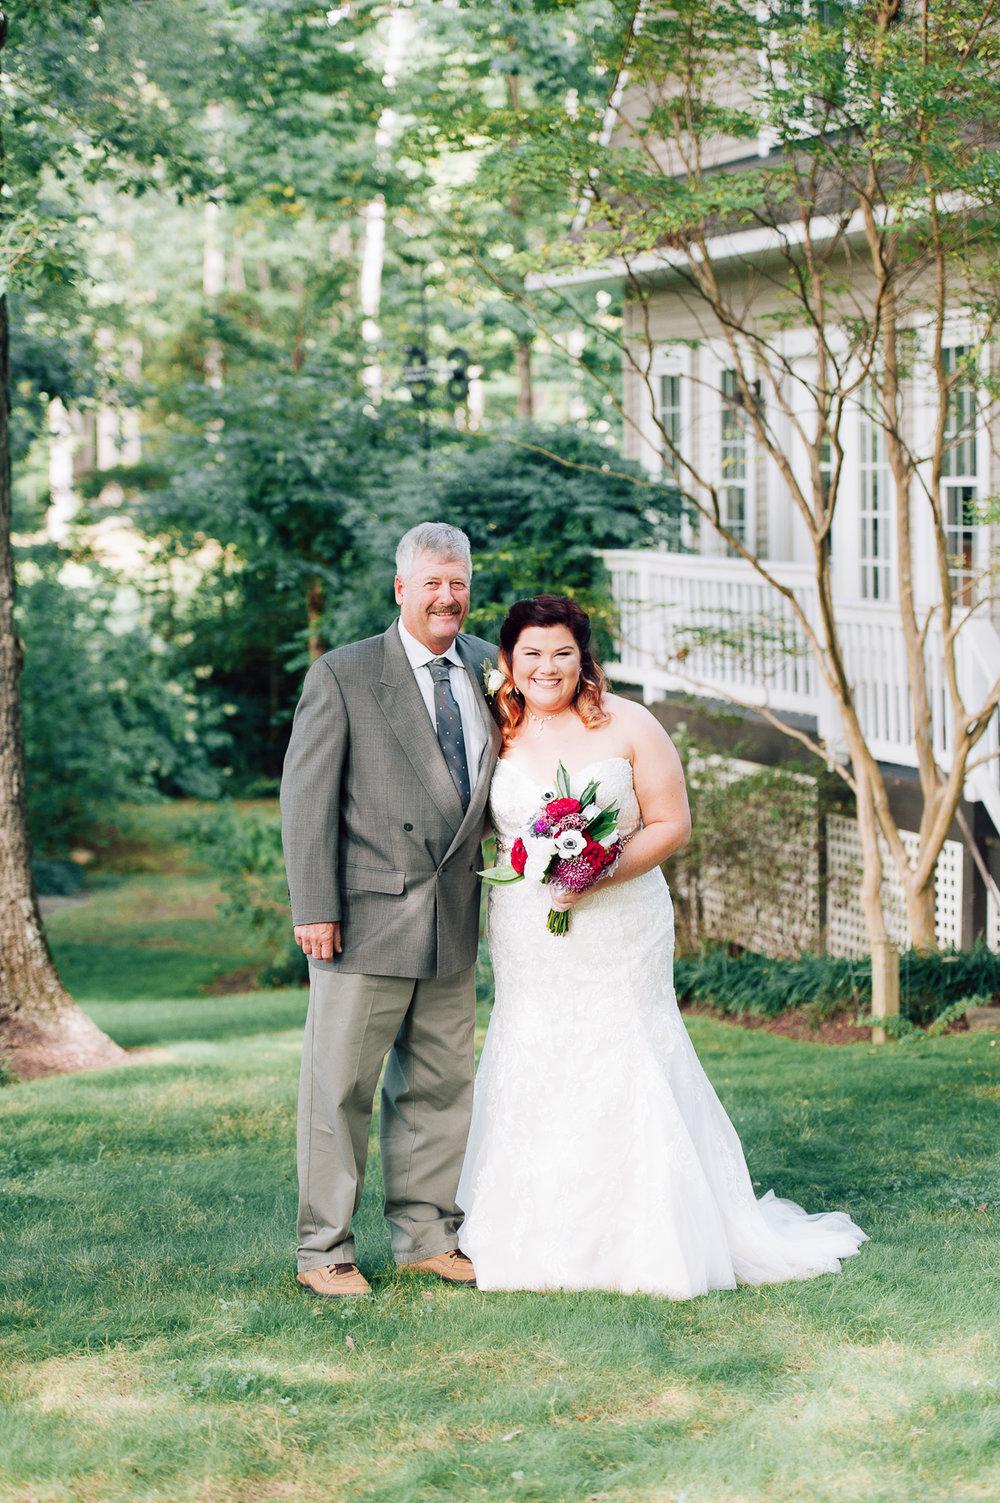 virginiawedding_GlenGarden_rusticwedding_fredericksburg_youseephotography_KellySteven (21).jpg